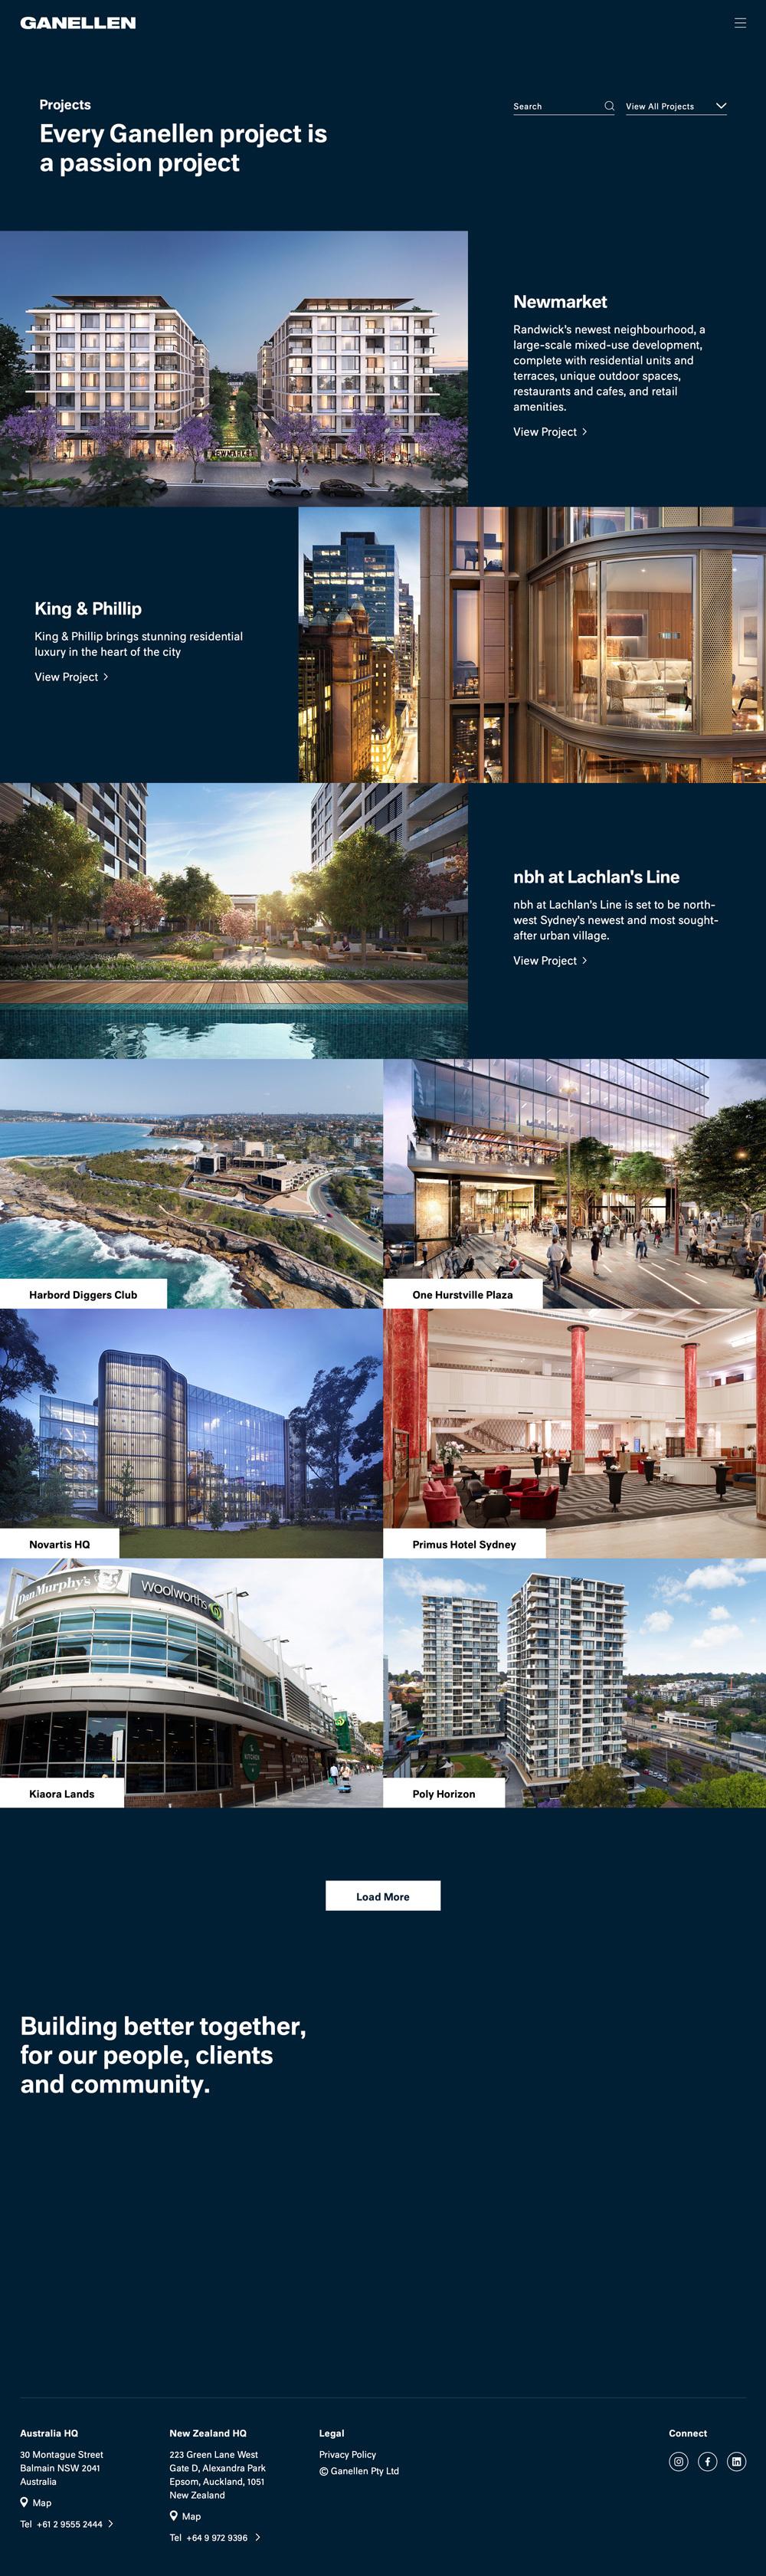 Ganellen Projects